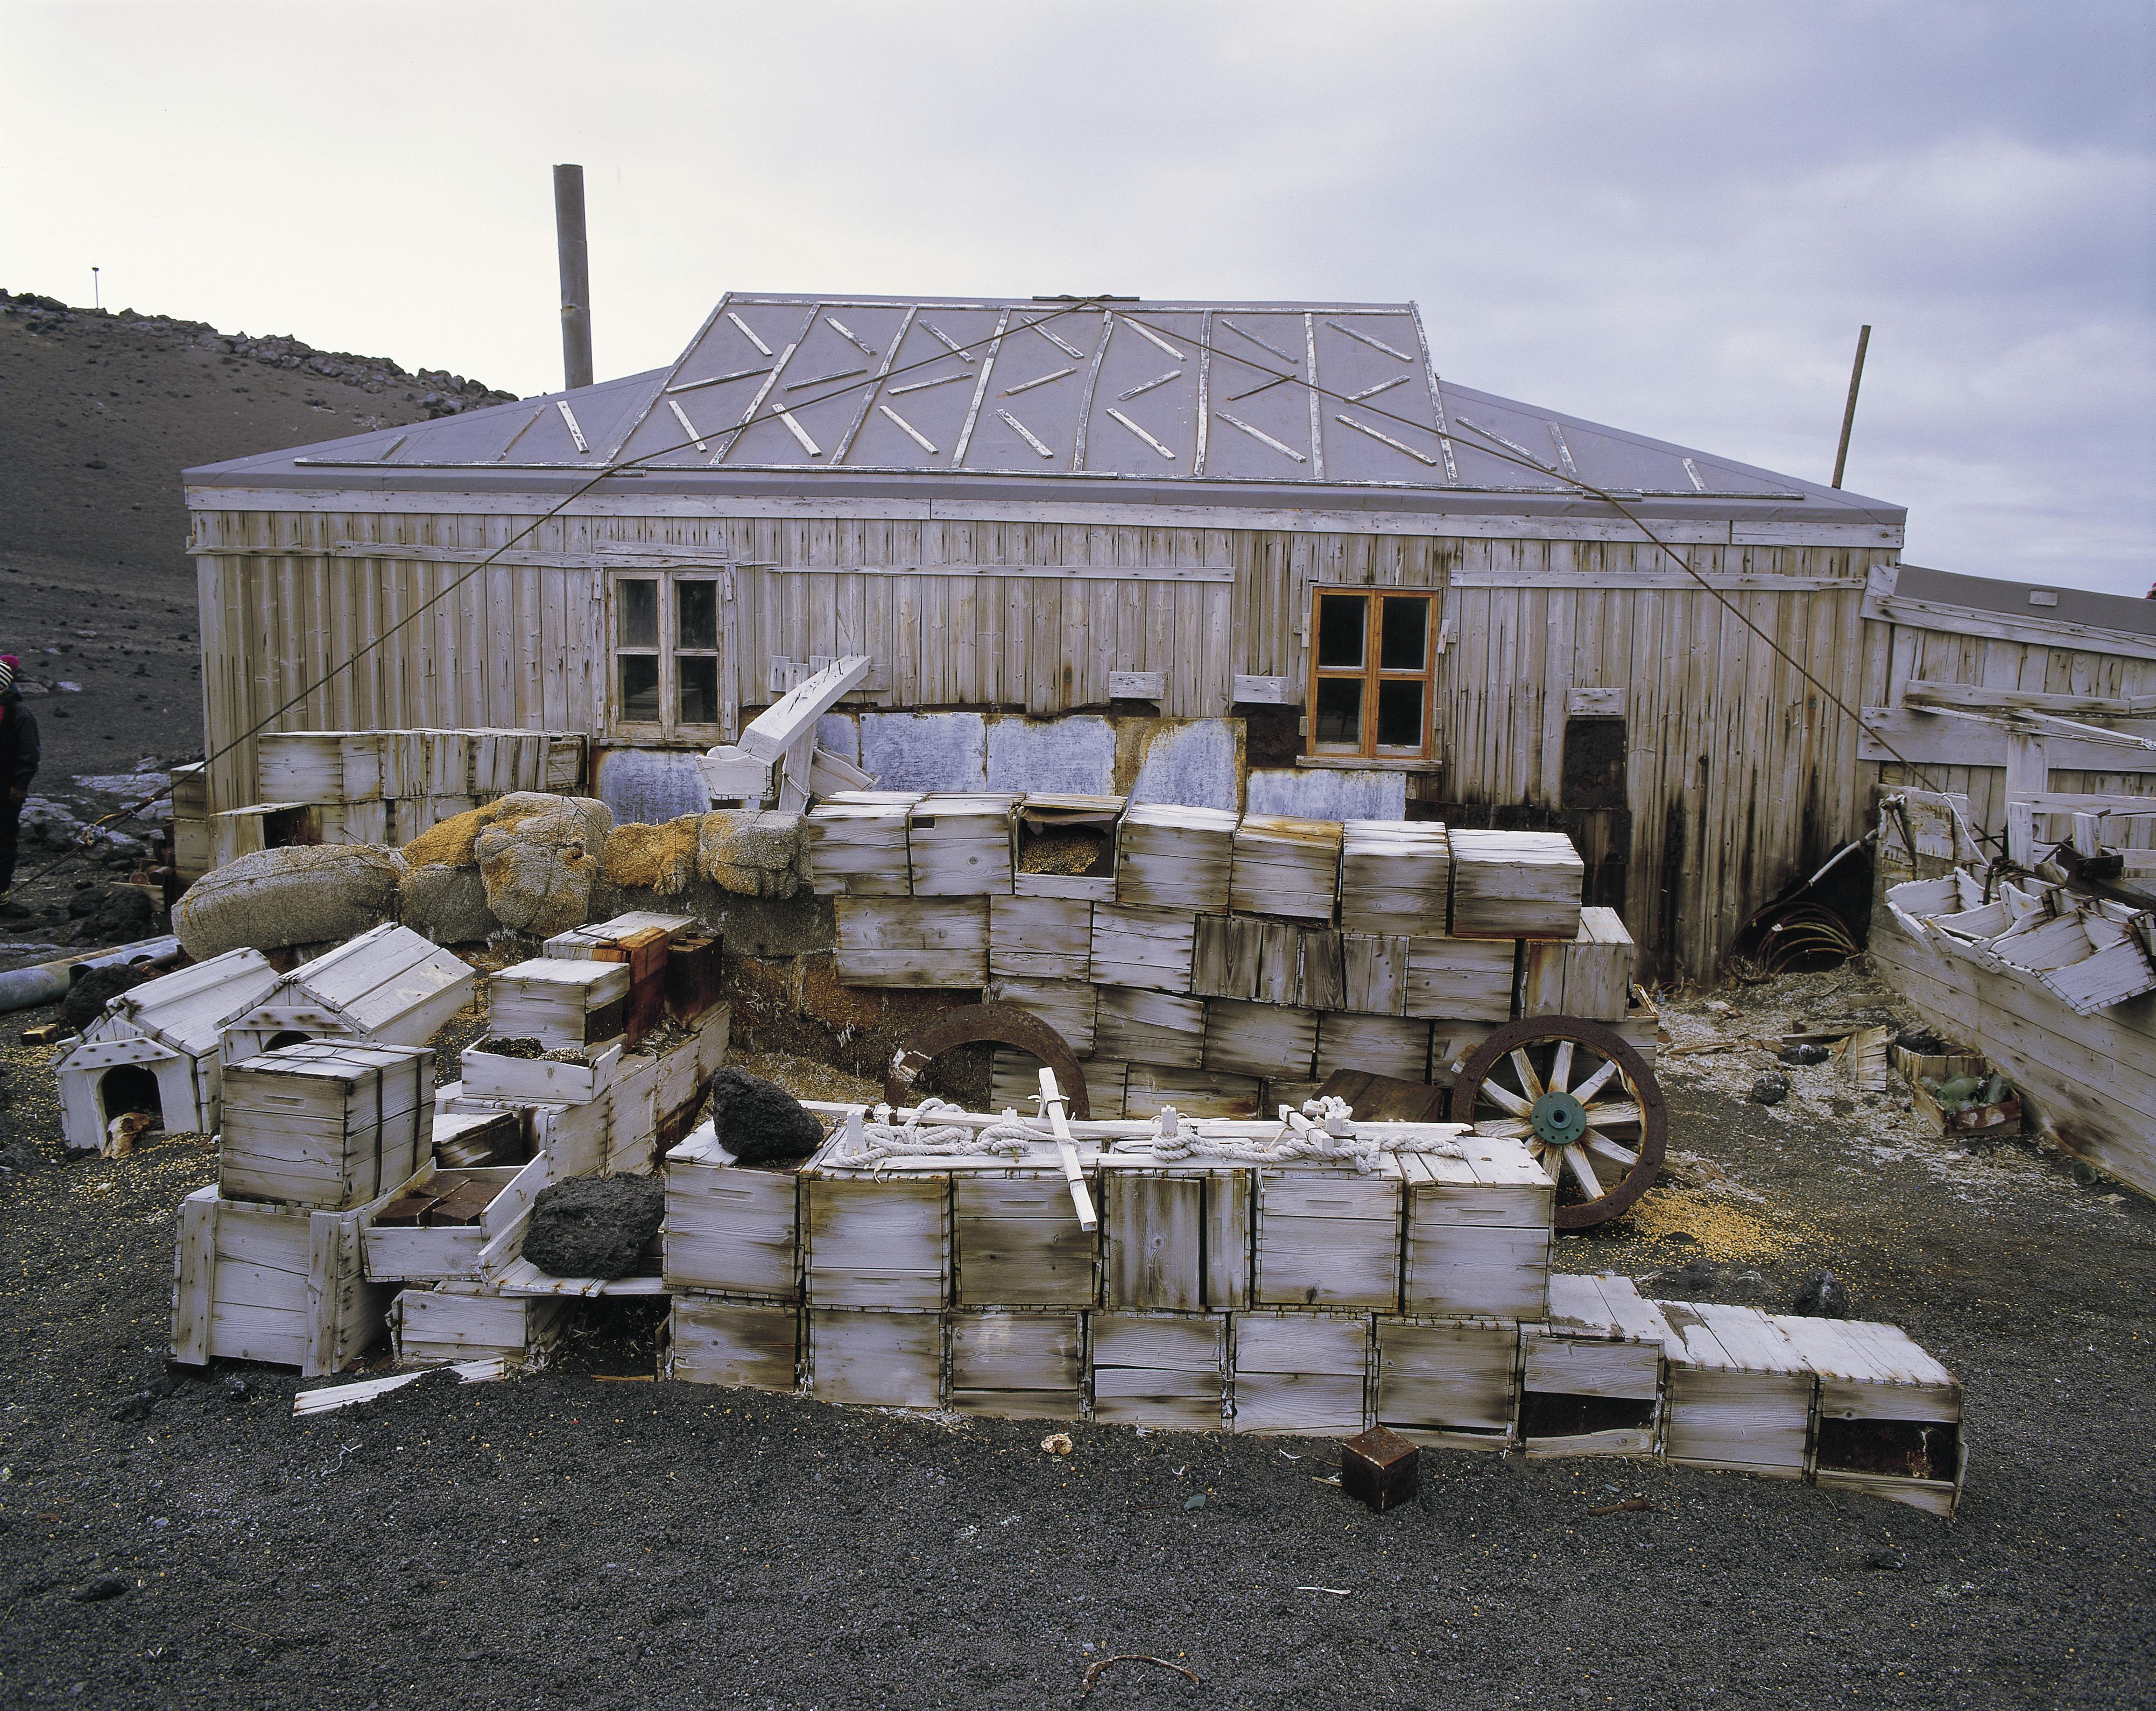 Shackleton's hut in Antarctica